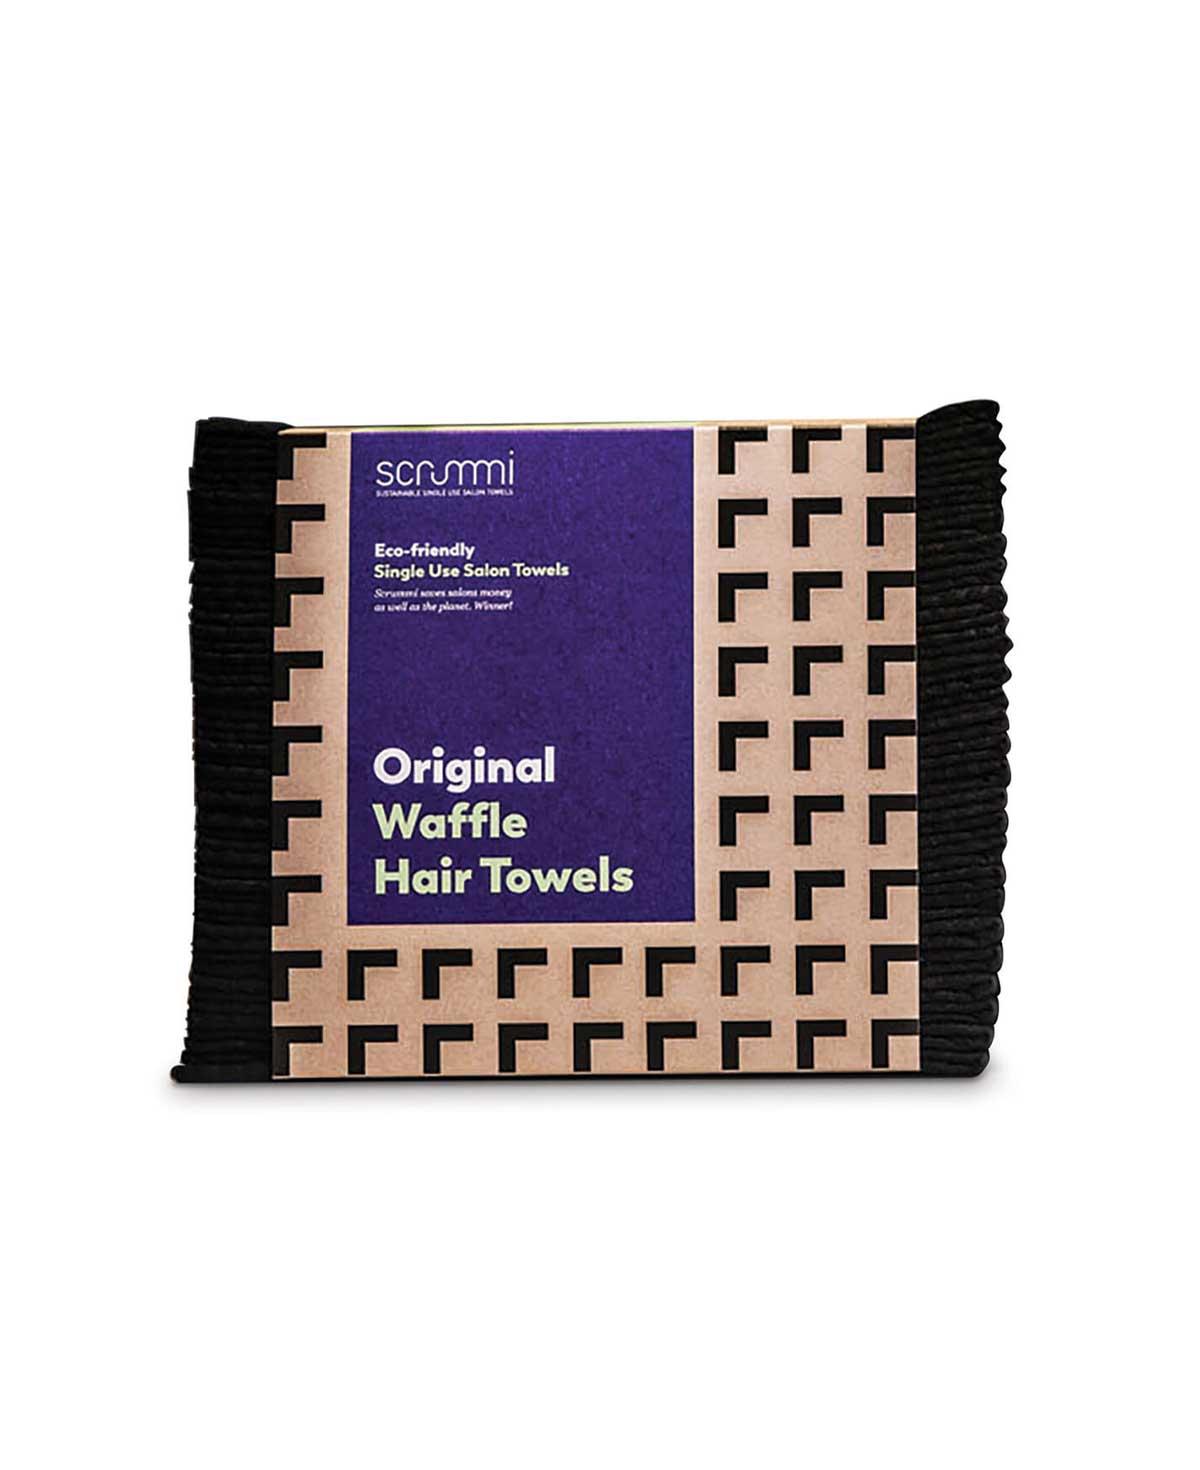 Scrummi Waffle Black Hair Towels, 80x40cm, 500 Stk.